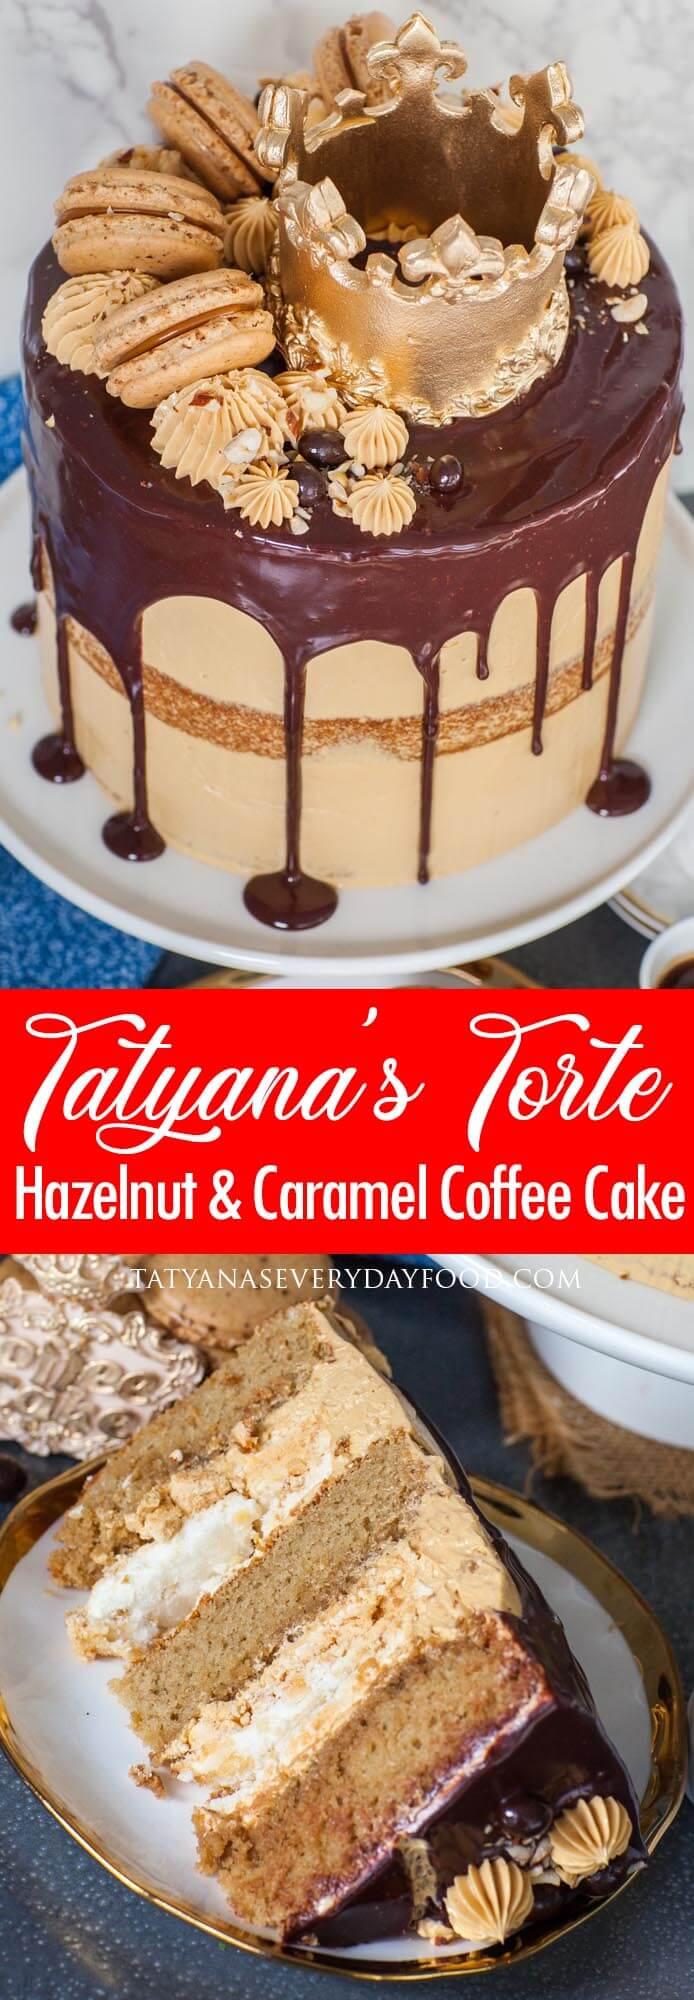 Hazelnut Coffee Cake video recipe